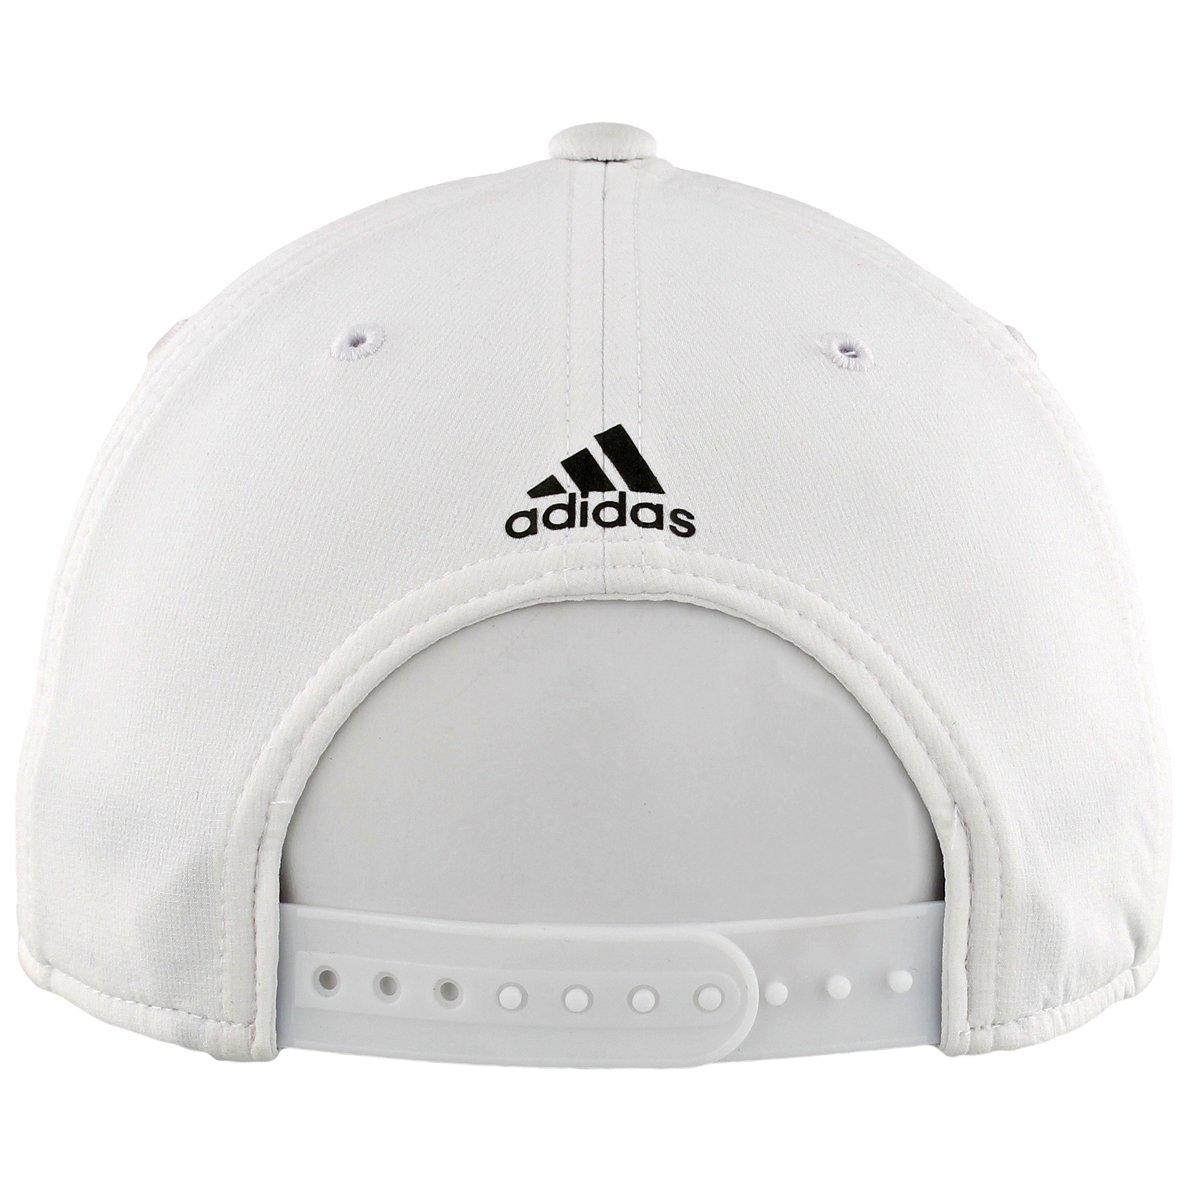 a0dd8df2413 adidas Mens Adizero Reflective Snapback Cap